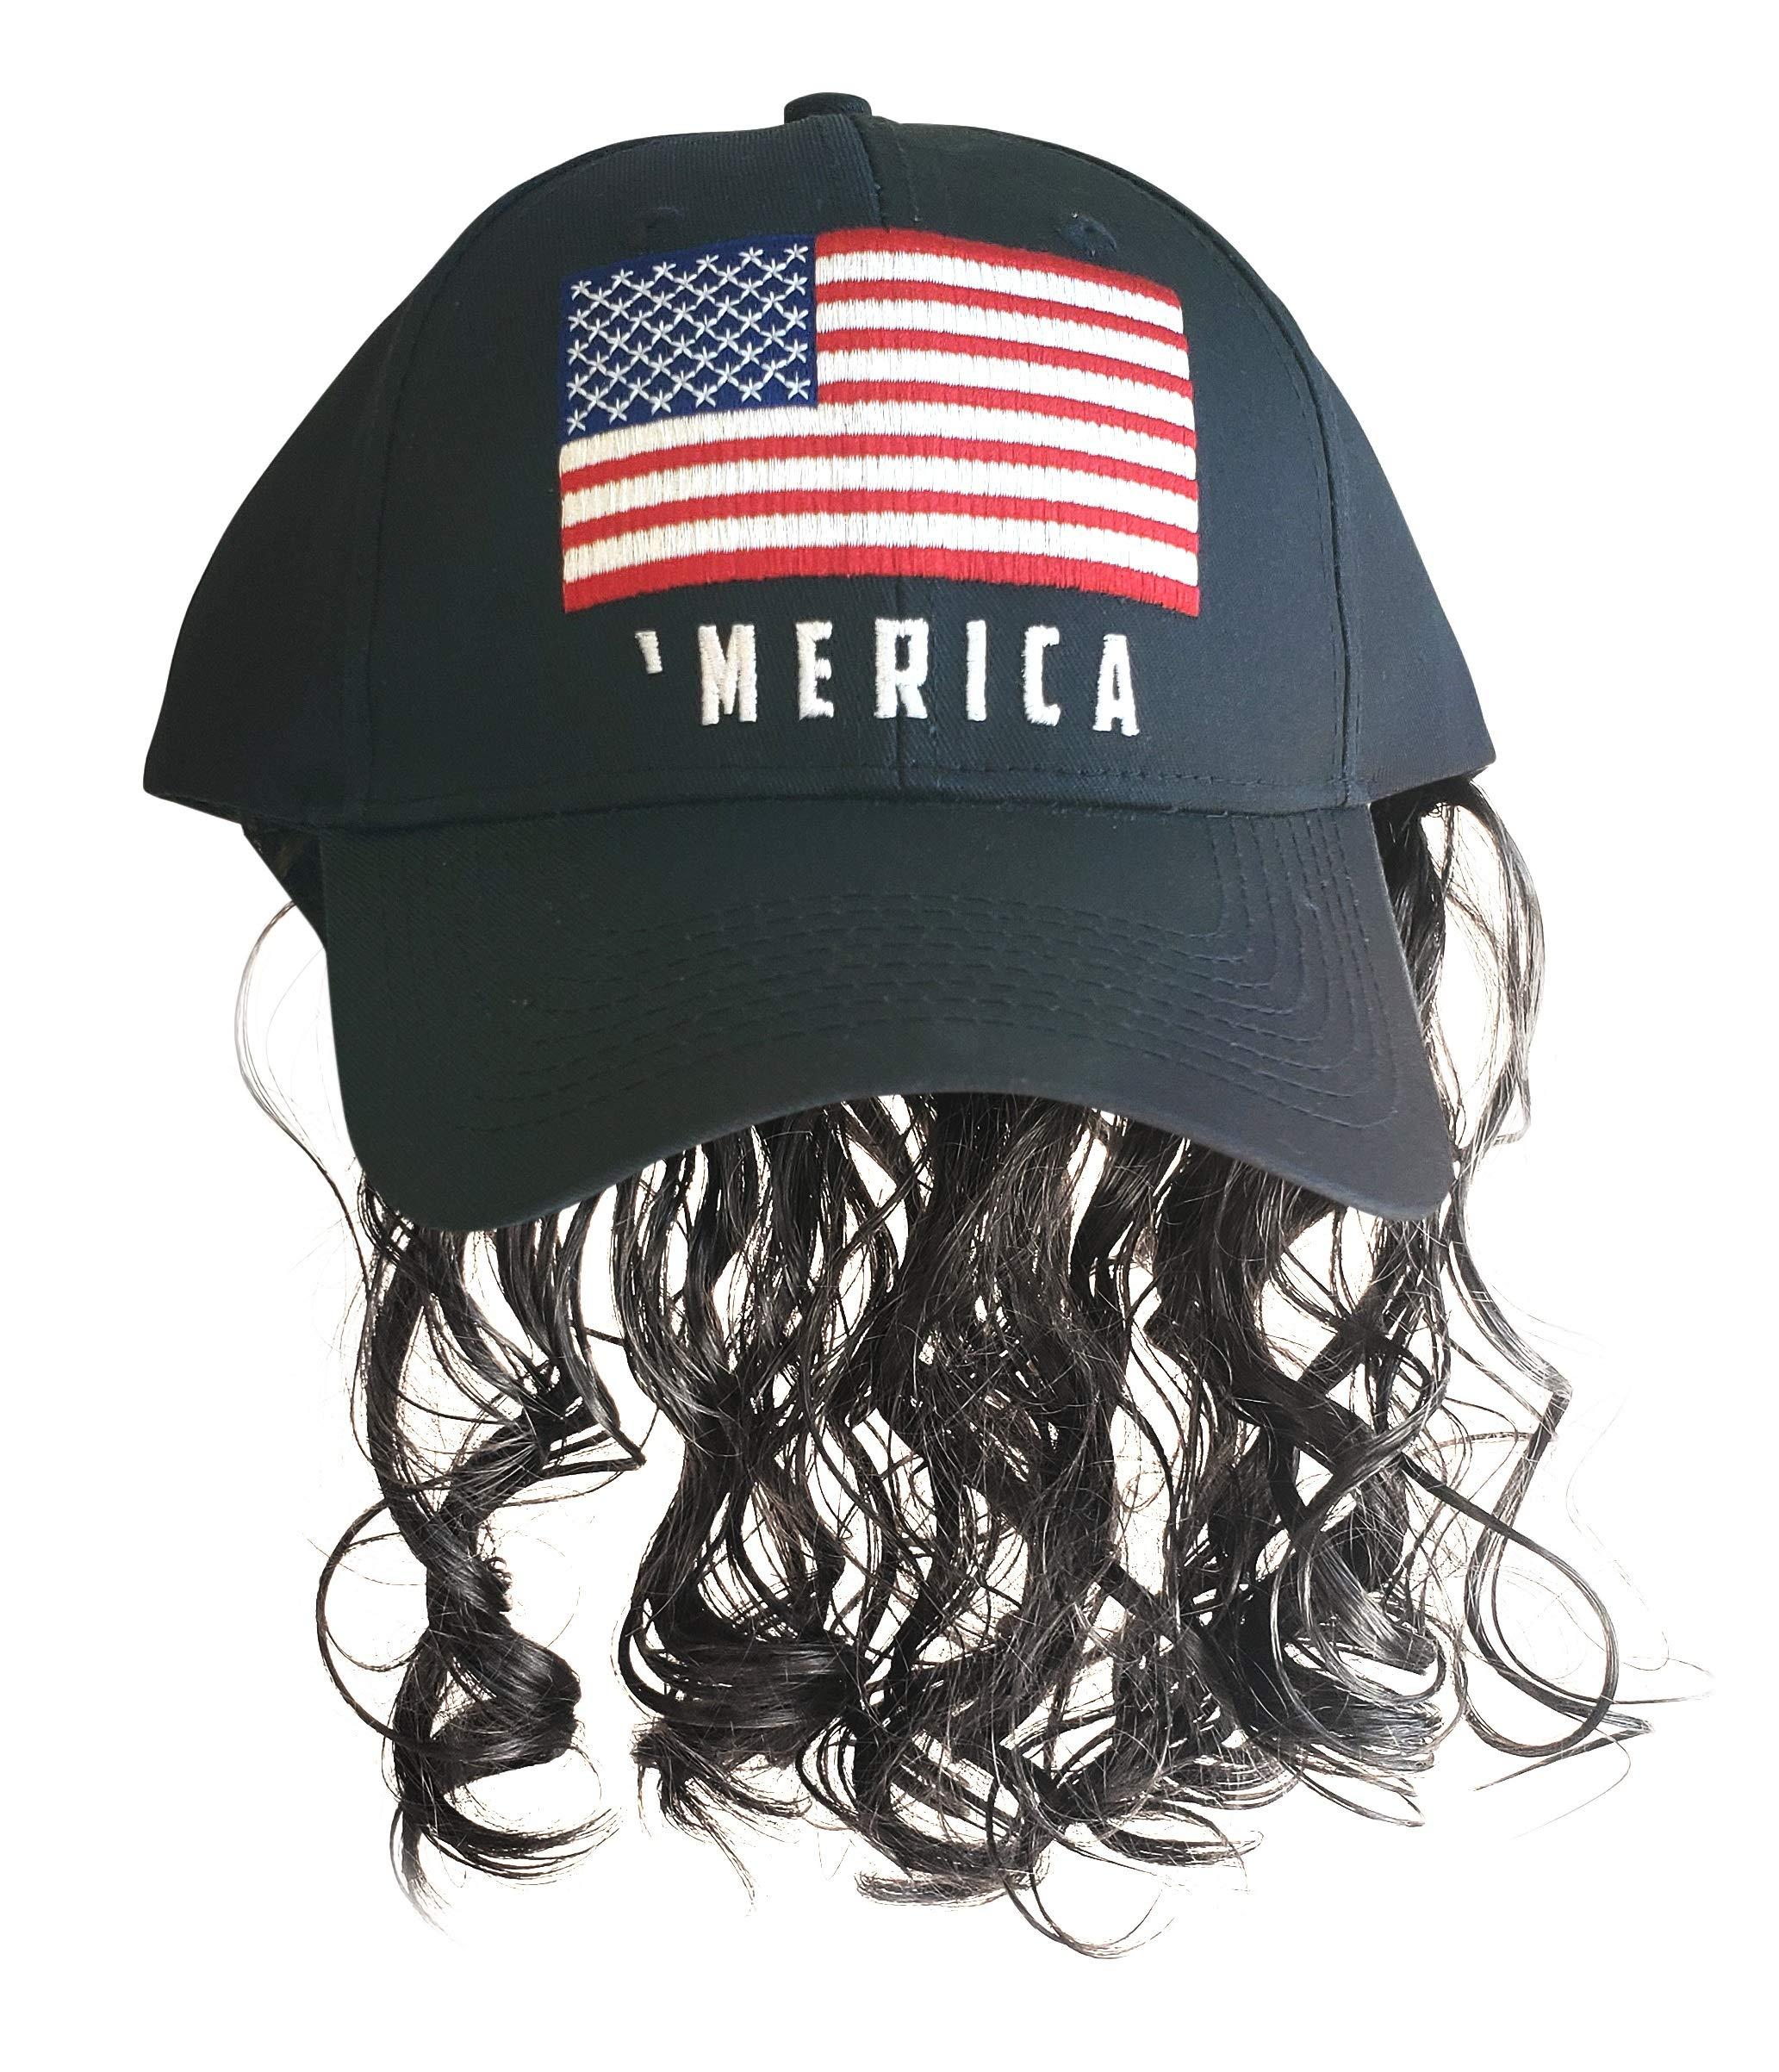 Artisan Owl Black 'Merica Flag Mullet Wig Baseball Cap by Artisan Owl